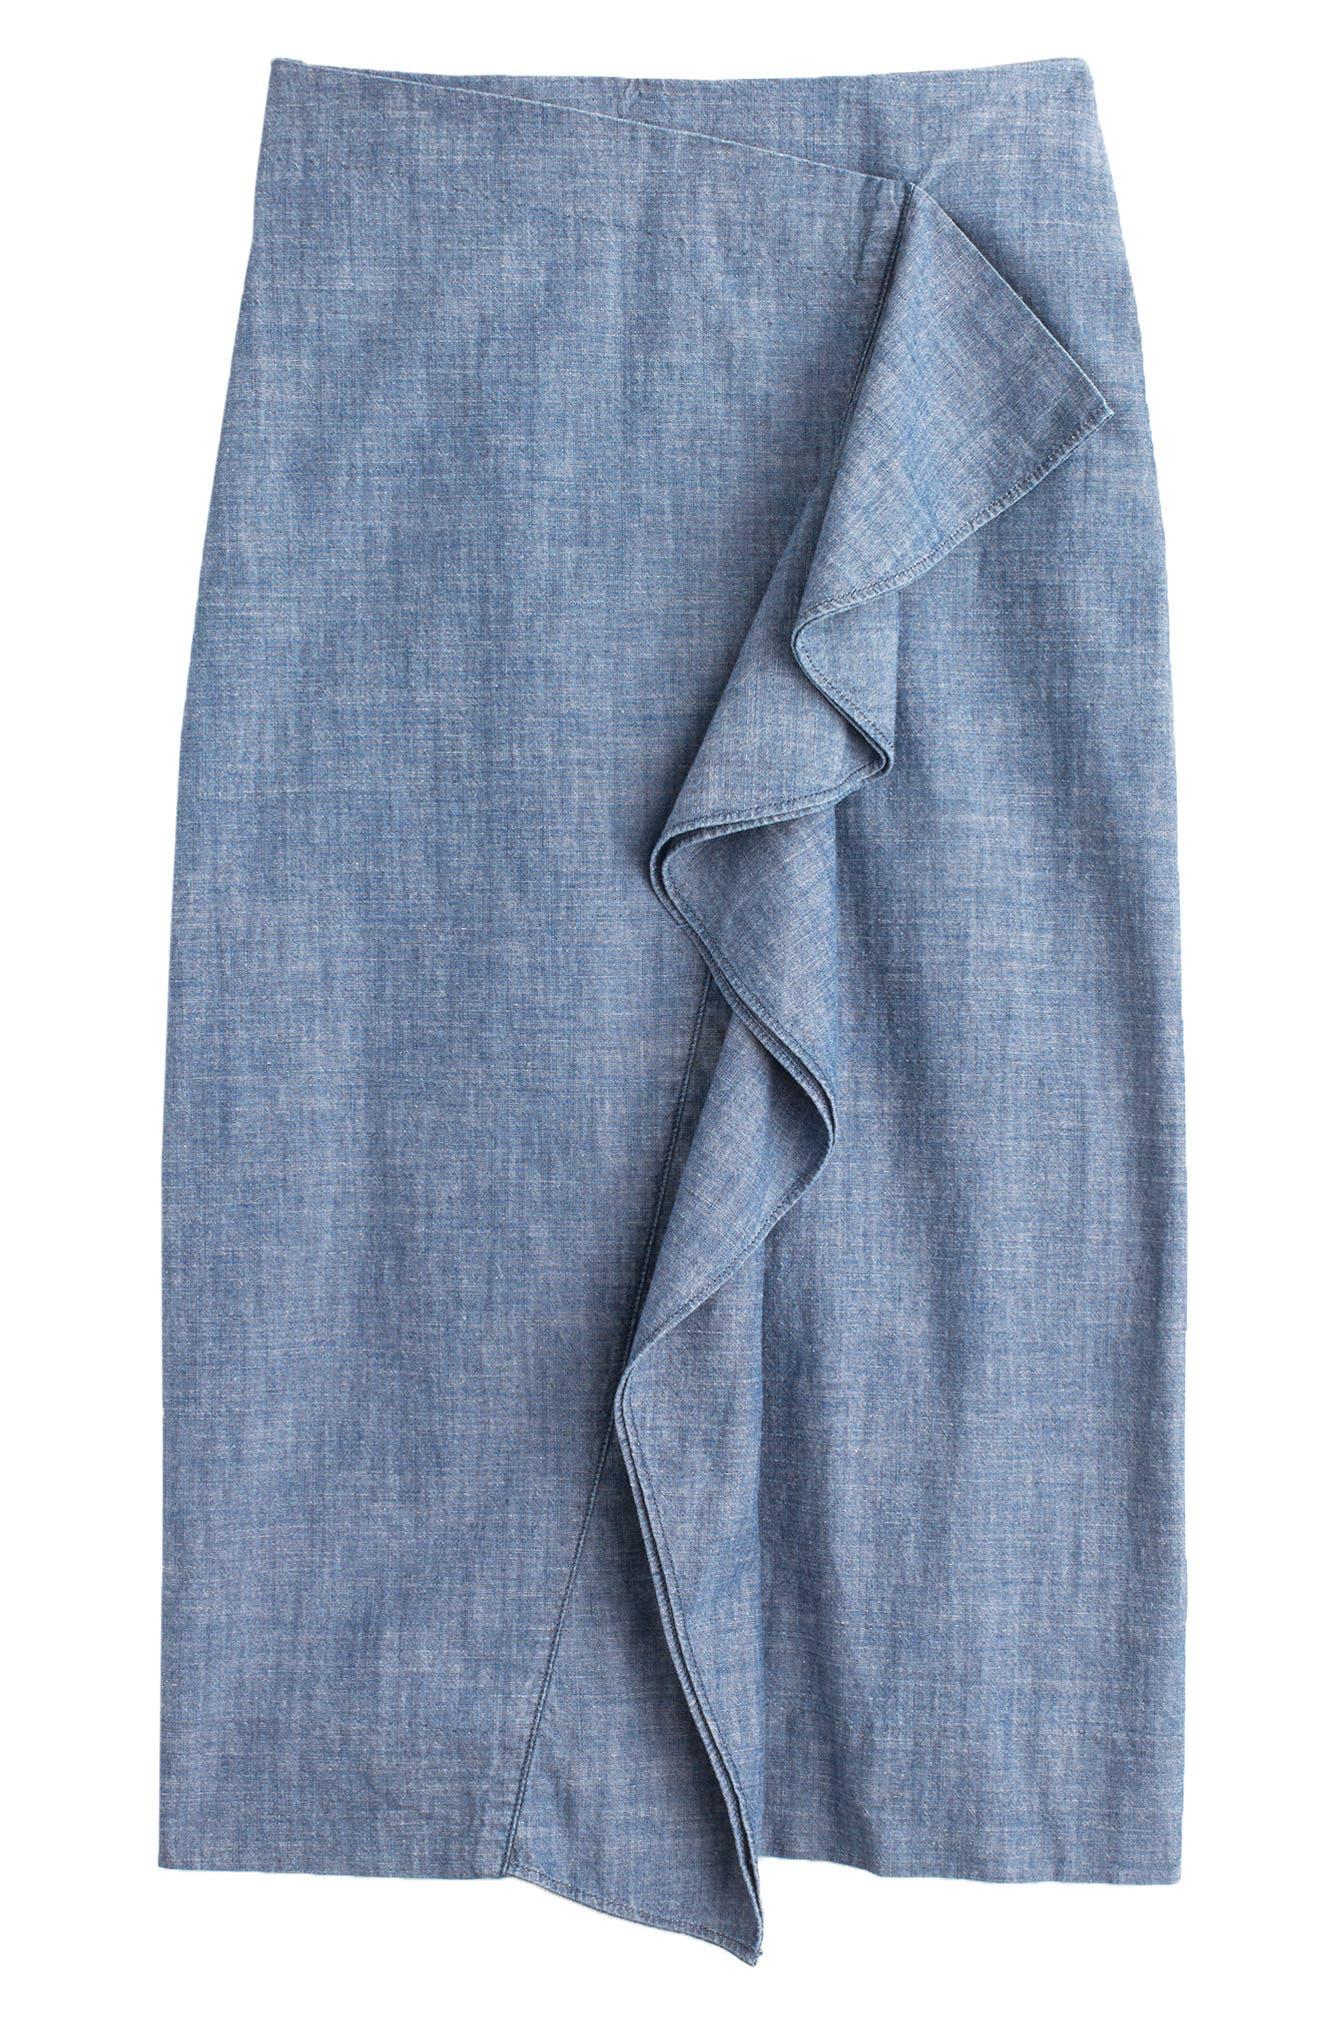 Chambray Ruffle Skirt,                             Alternate thumbnail 3, color,                             400